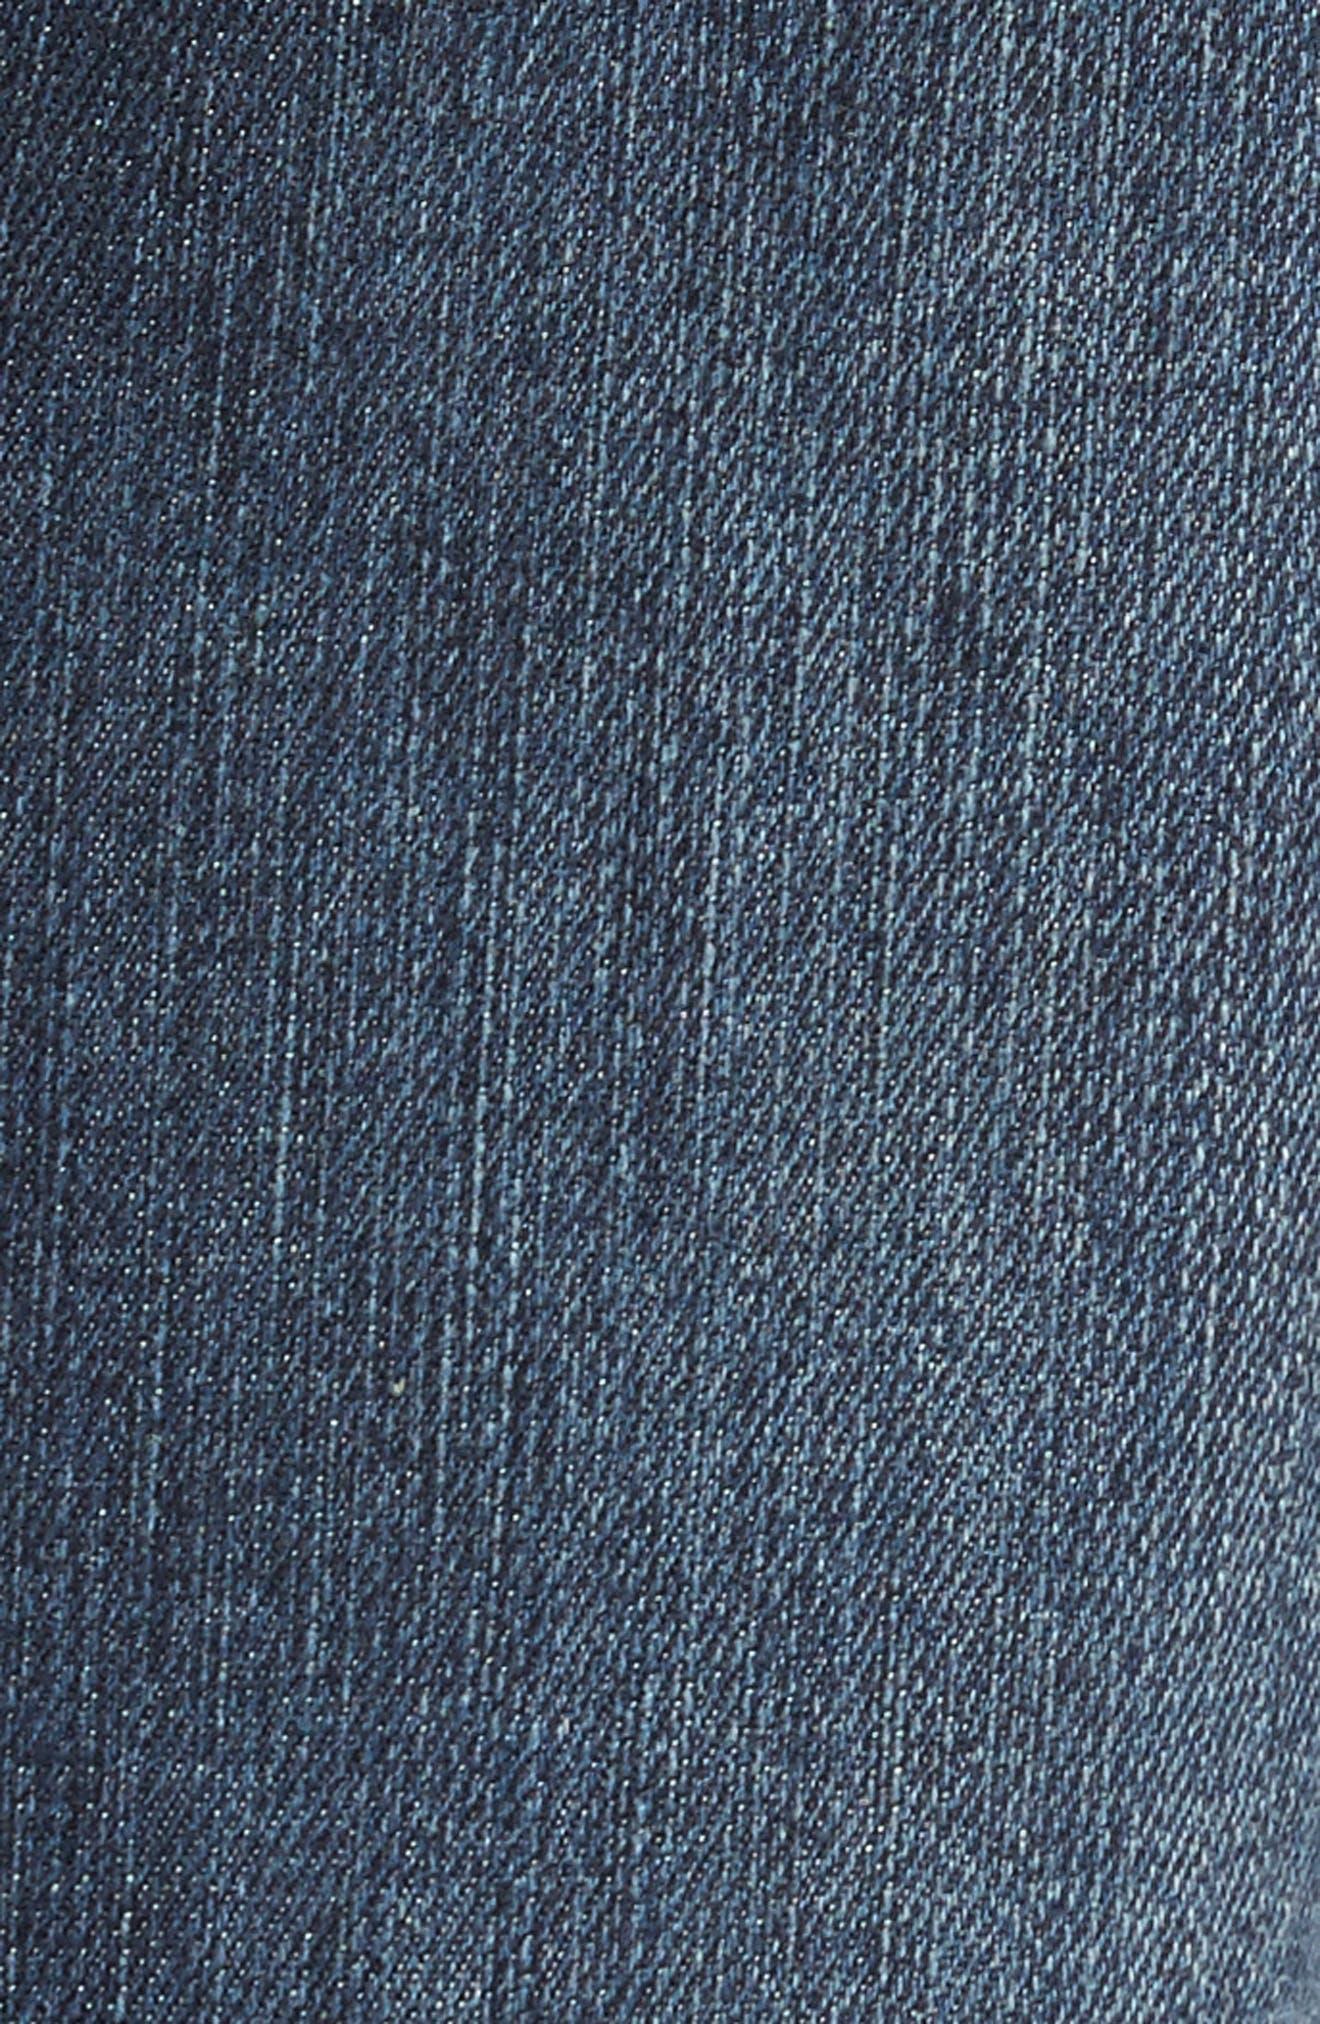 Alternate Image 5  - Travis Mathew 'Duke' Relaxed Fit Jeans (Vintage Indigo)